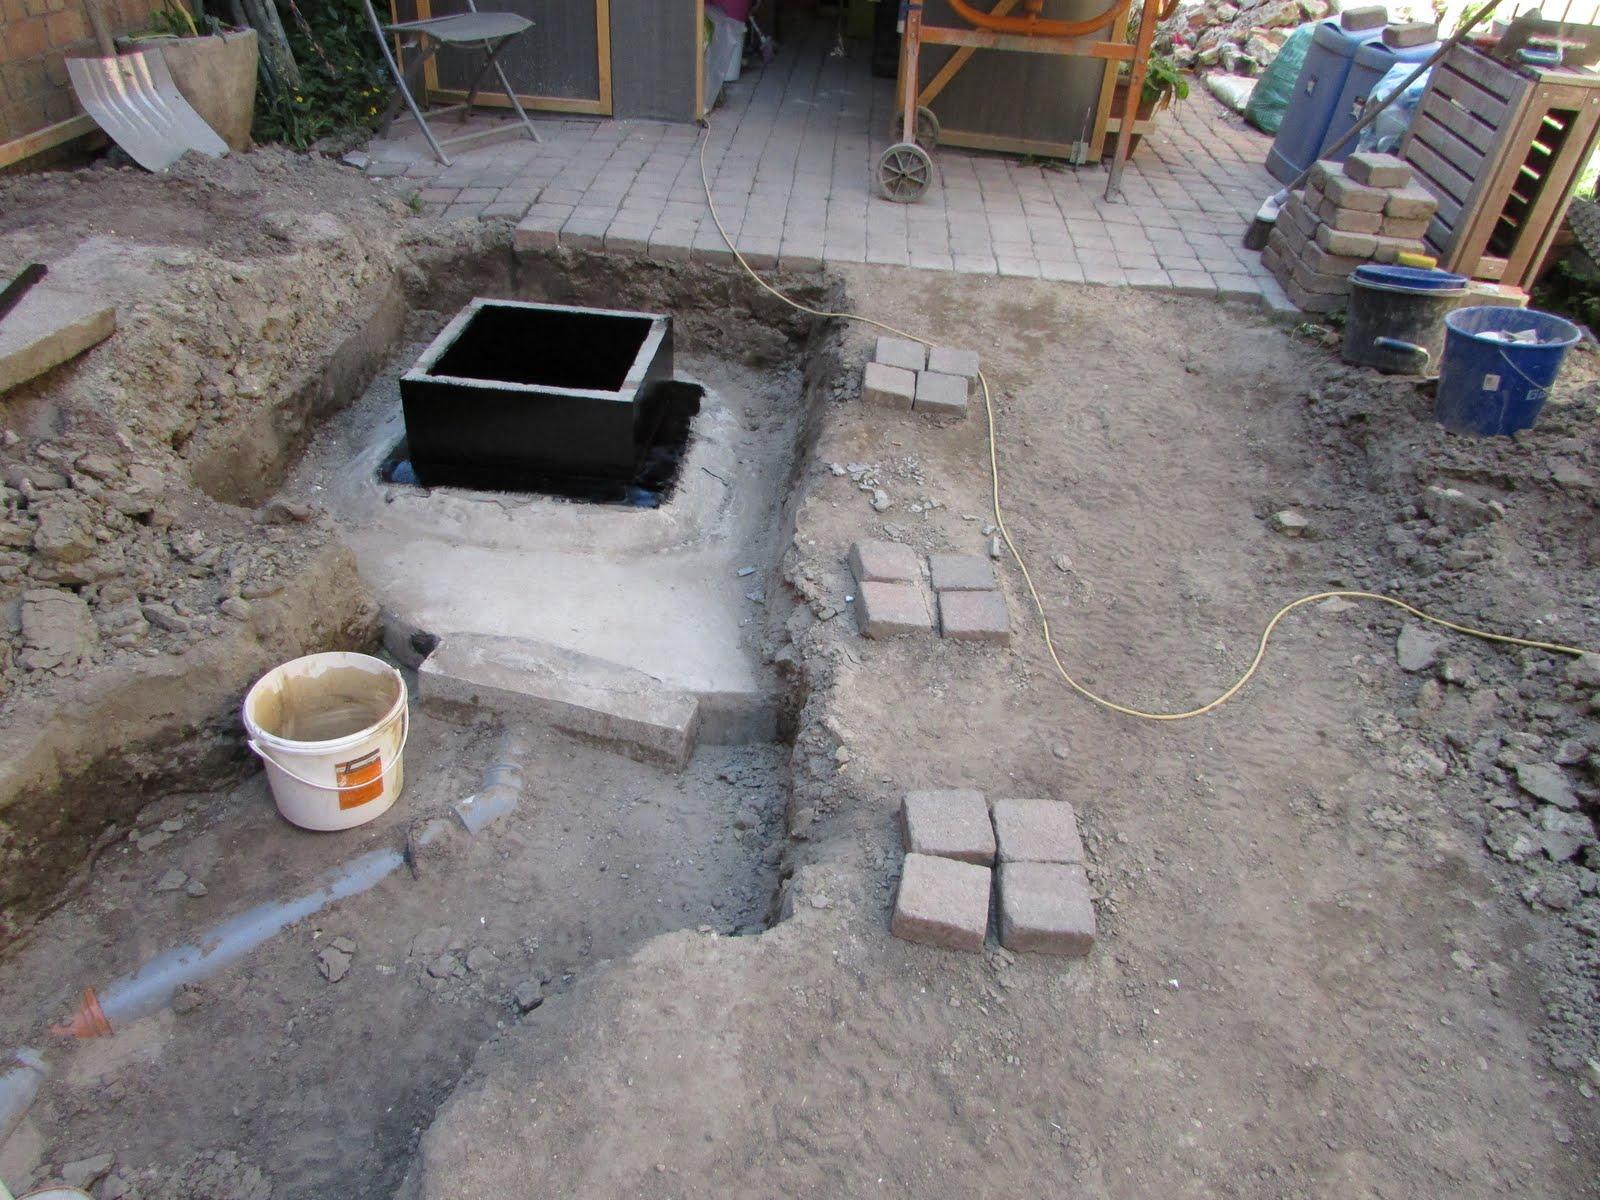 drainage aanleggen rond huis drainage en afvoer van het. Black Bedroom Furniture Sets. Home Design Ideas